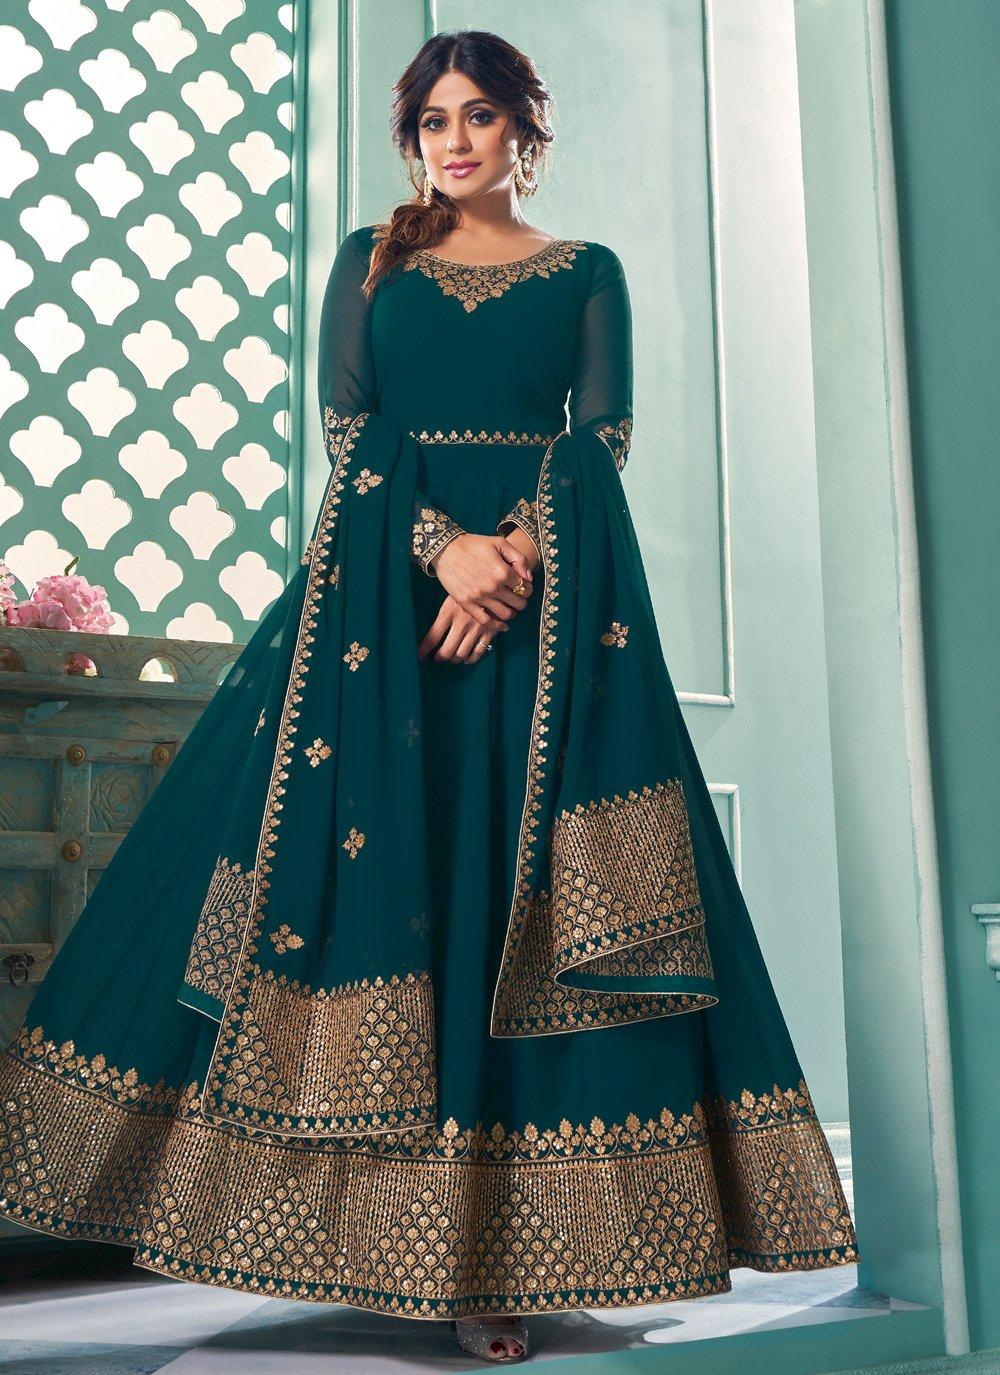 Shamita Shetty Teal Mehndi Floor Length Anarkali Suit